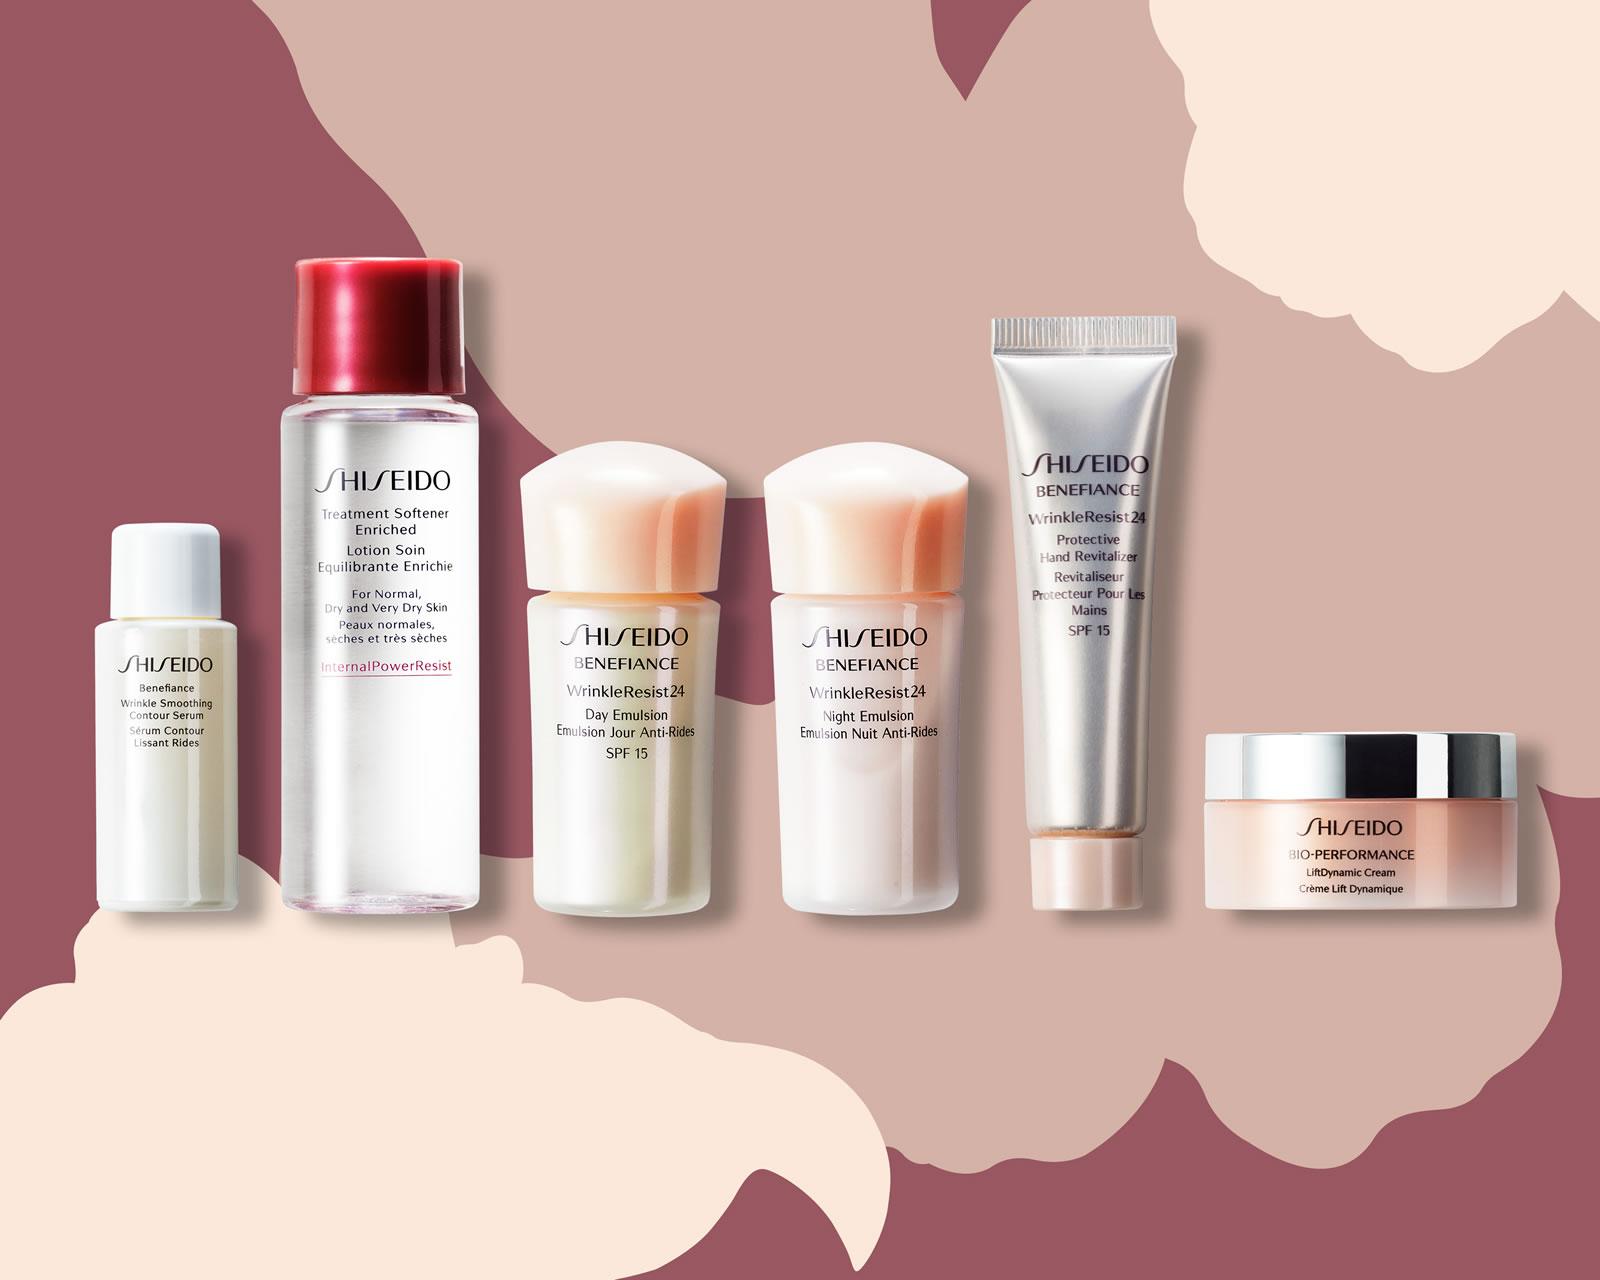 2019聖誕限定彩妝護膚品套裝,charlotte tilbury,shiseido